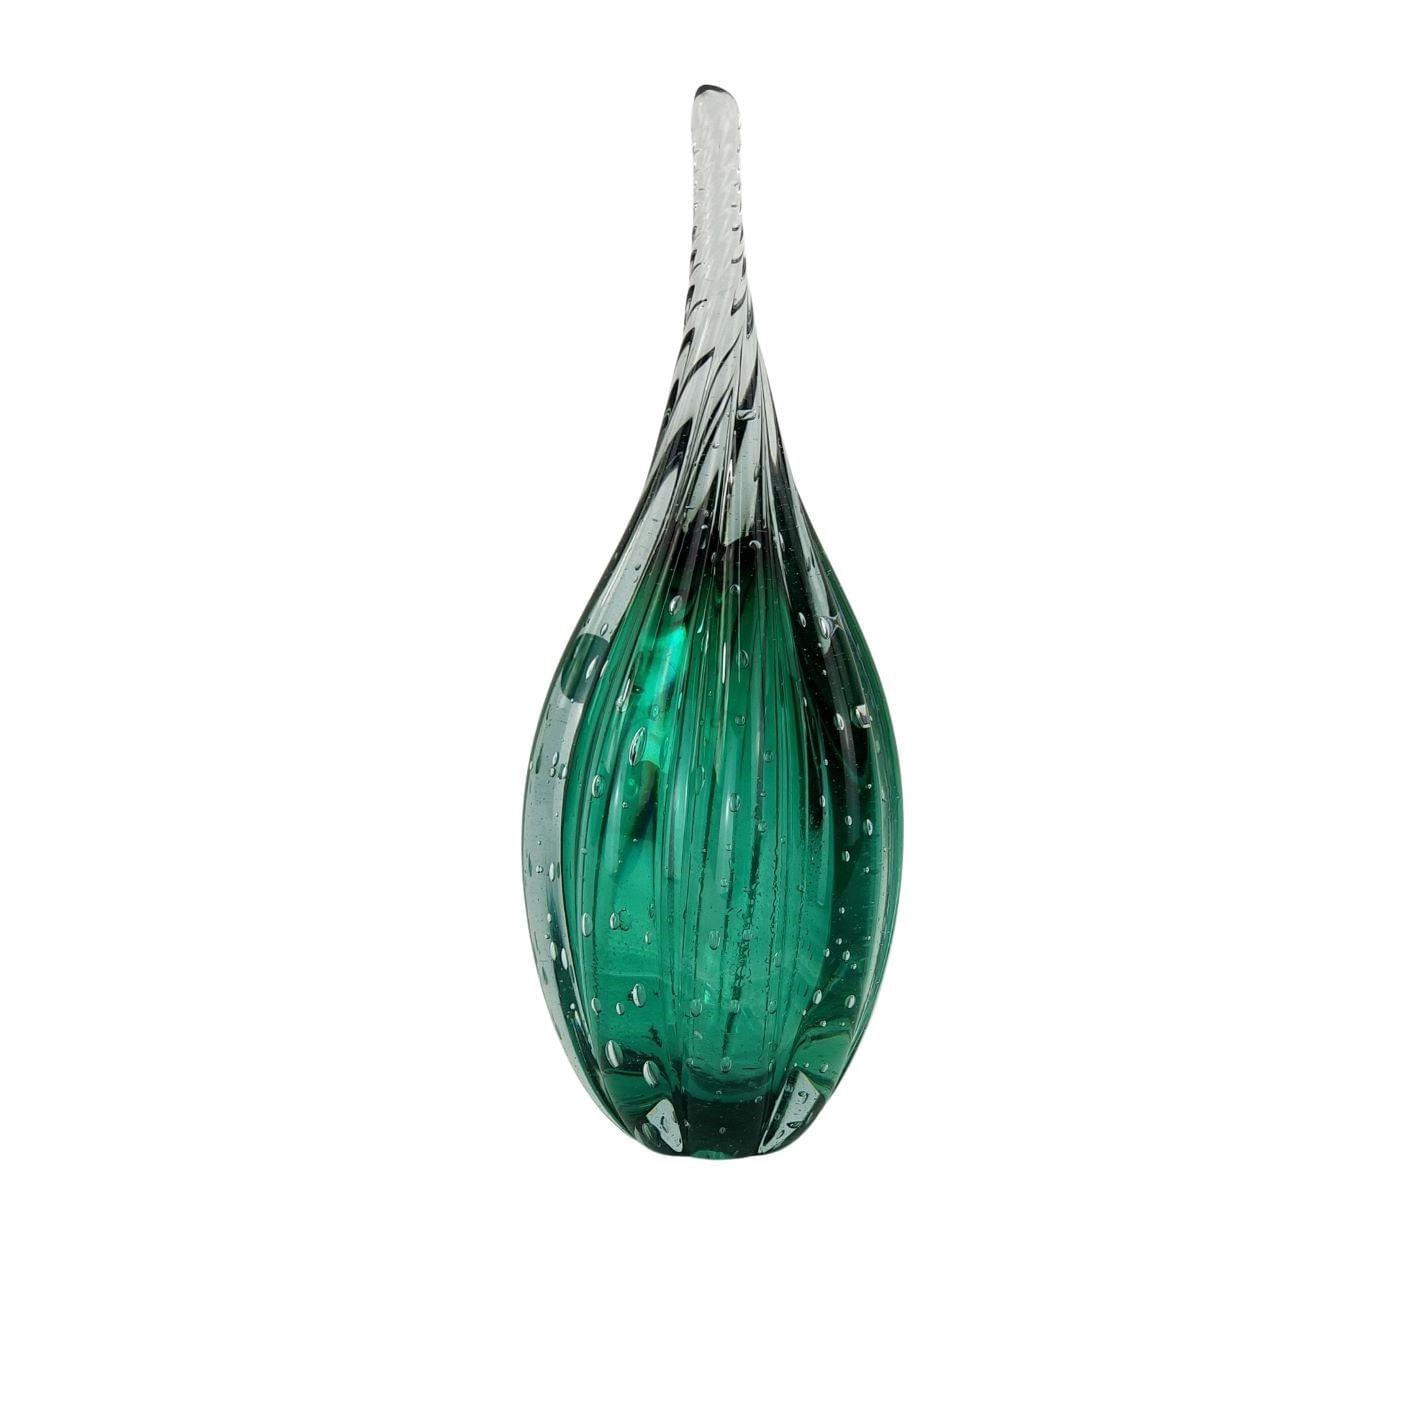 Gota de Vidro Torcido Tipo Murano - Verde Esmeralda Grande